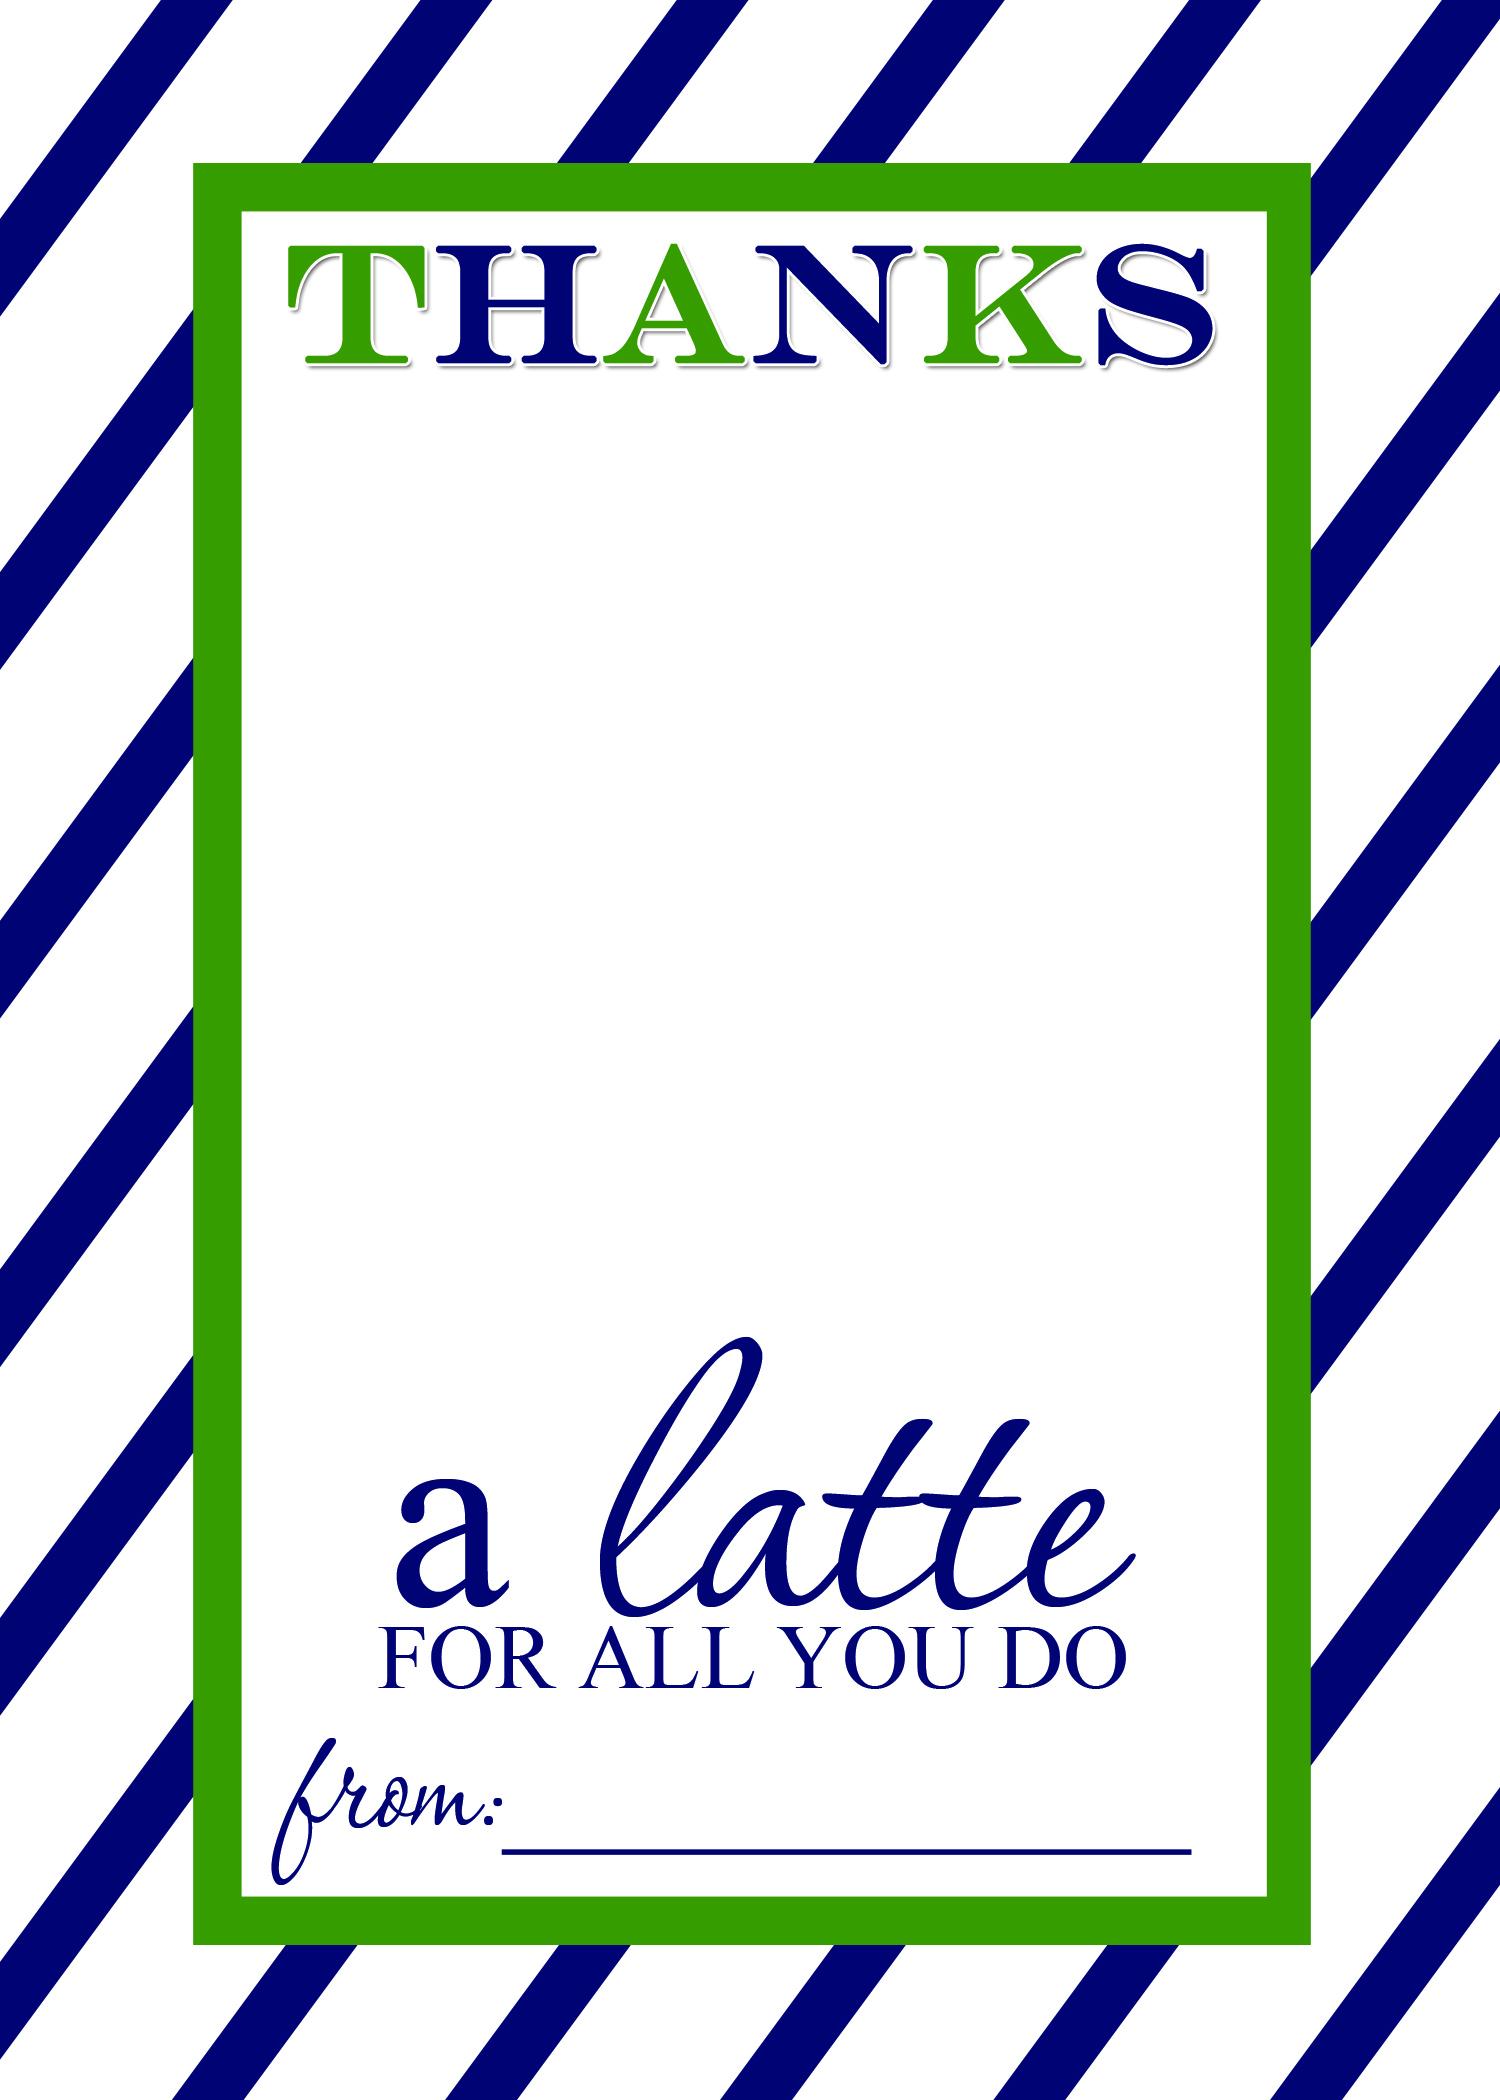 Teacher Appreciation Gift Idea - Thanks A Latte Free Printable Card - Thanks A Latte Free Printable